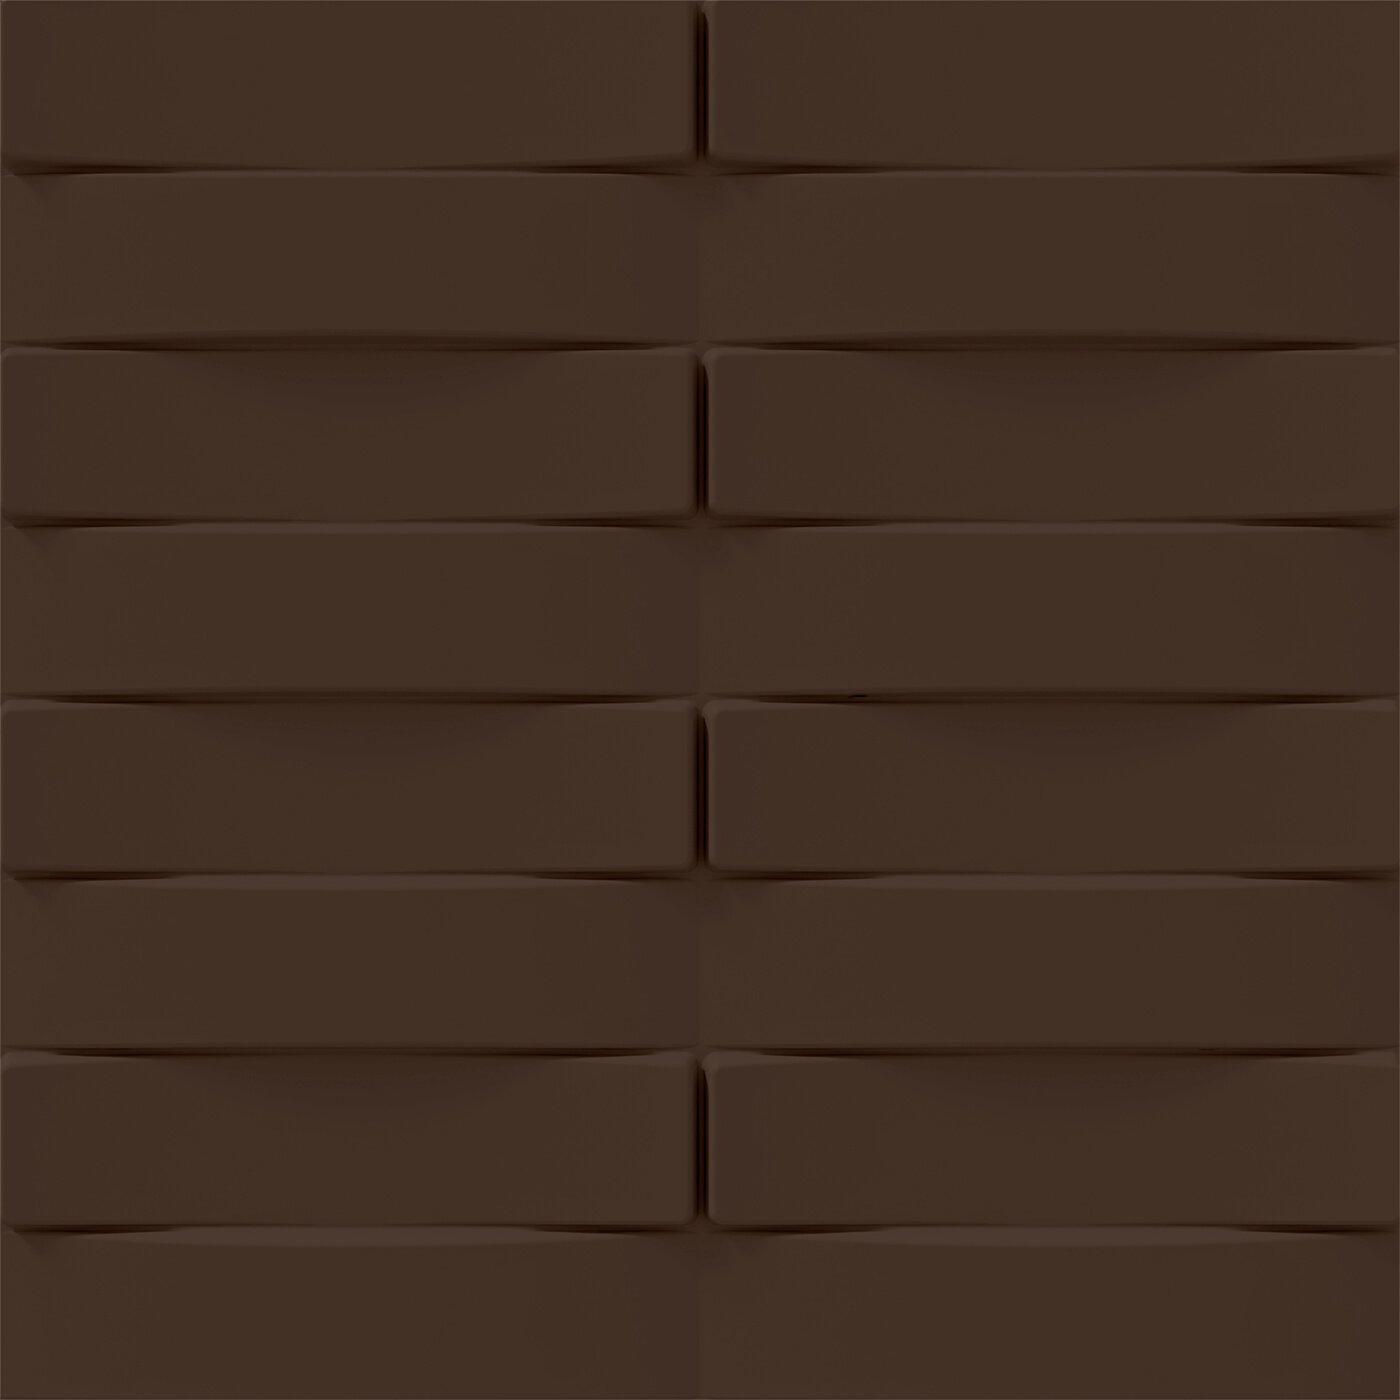 Thailand #Cocoa